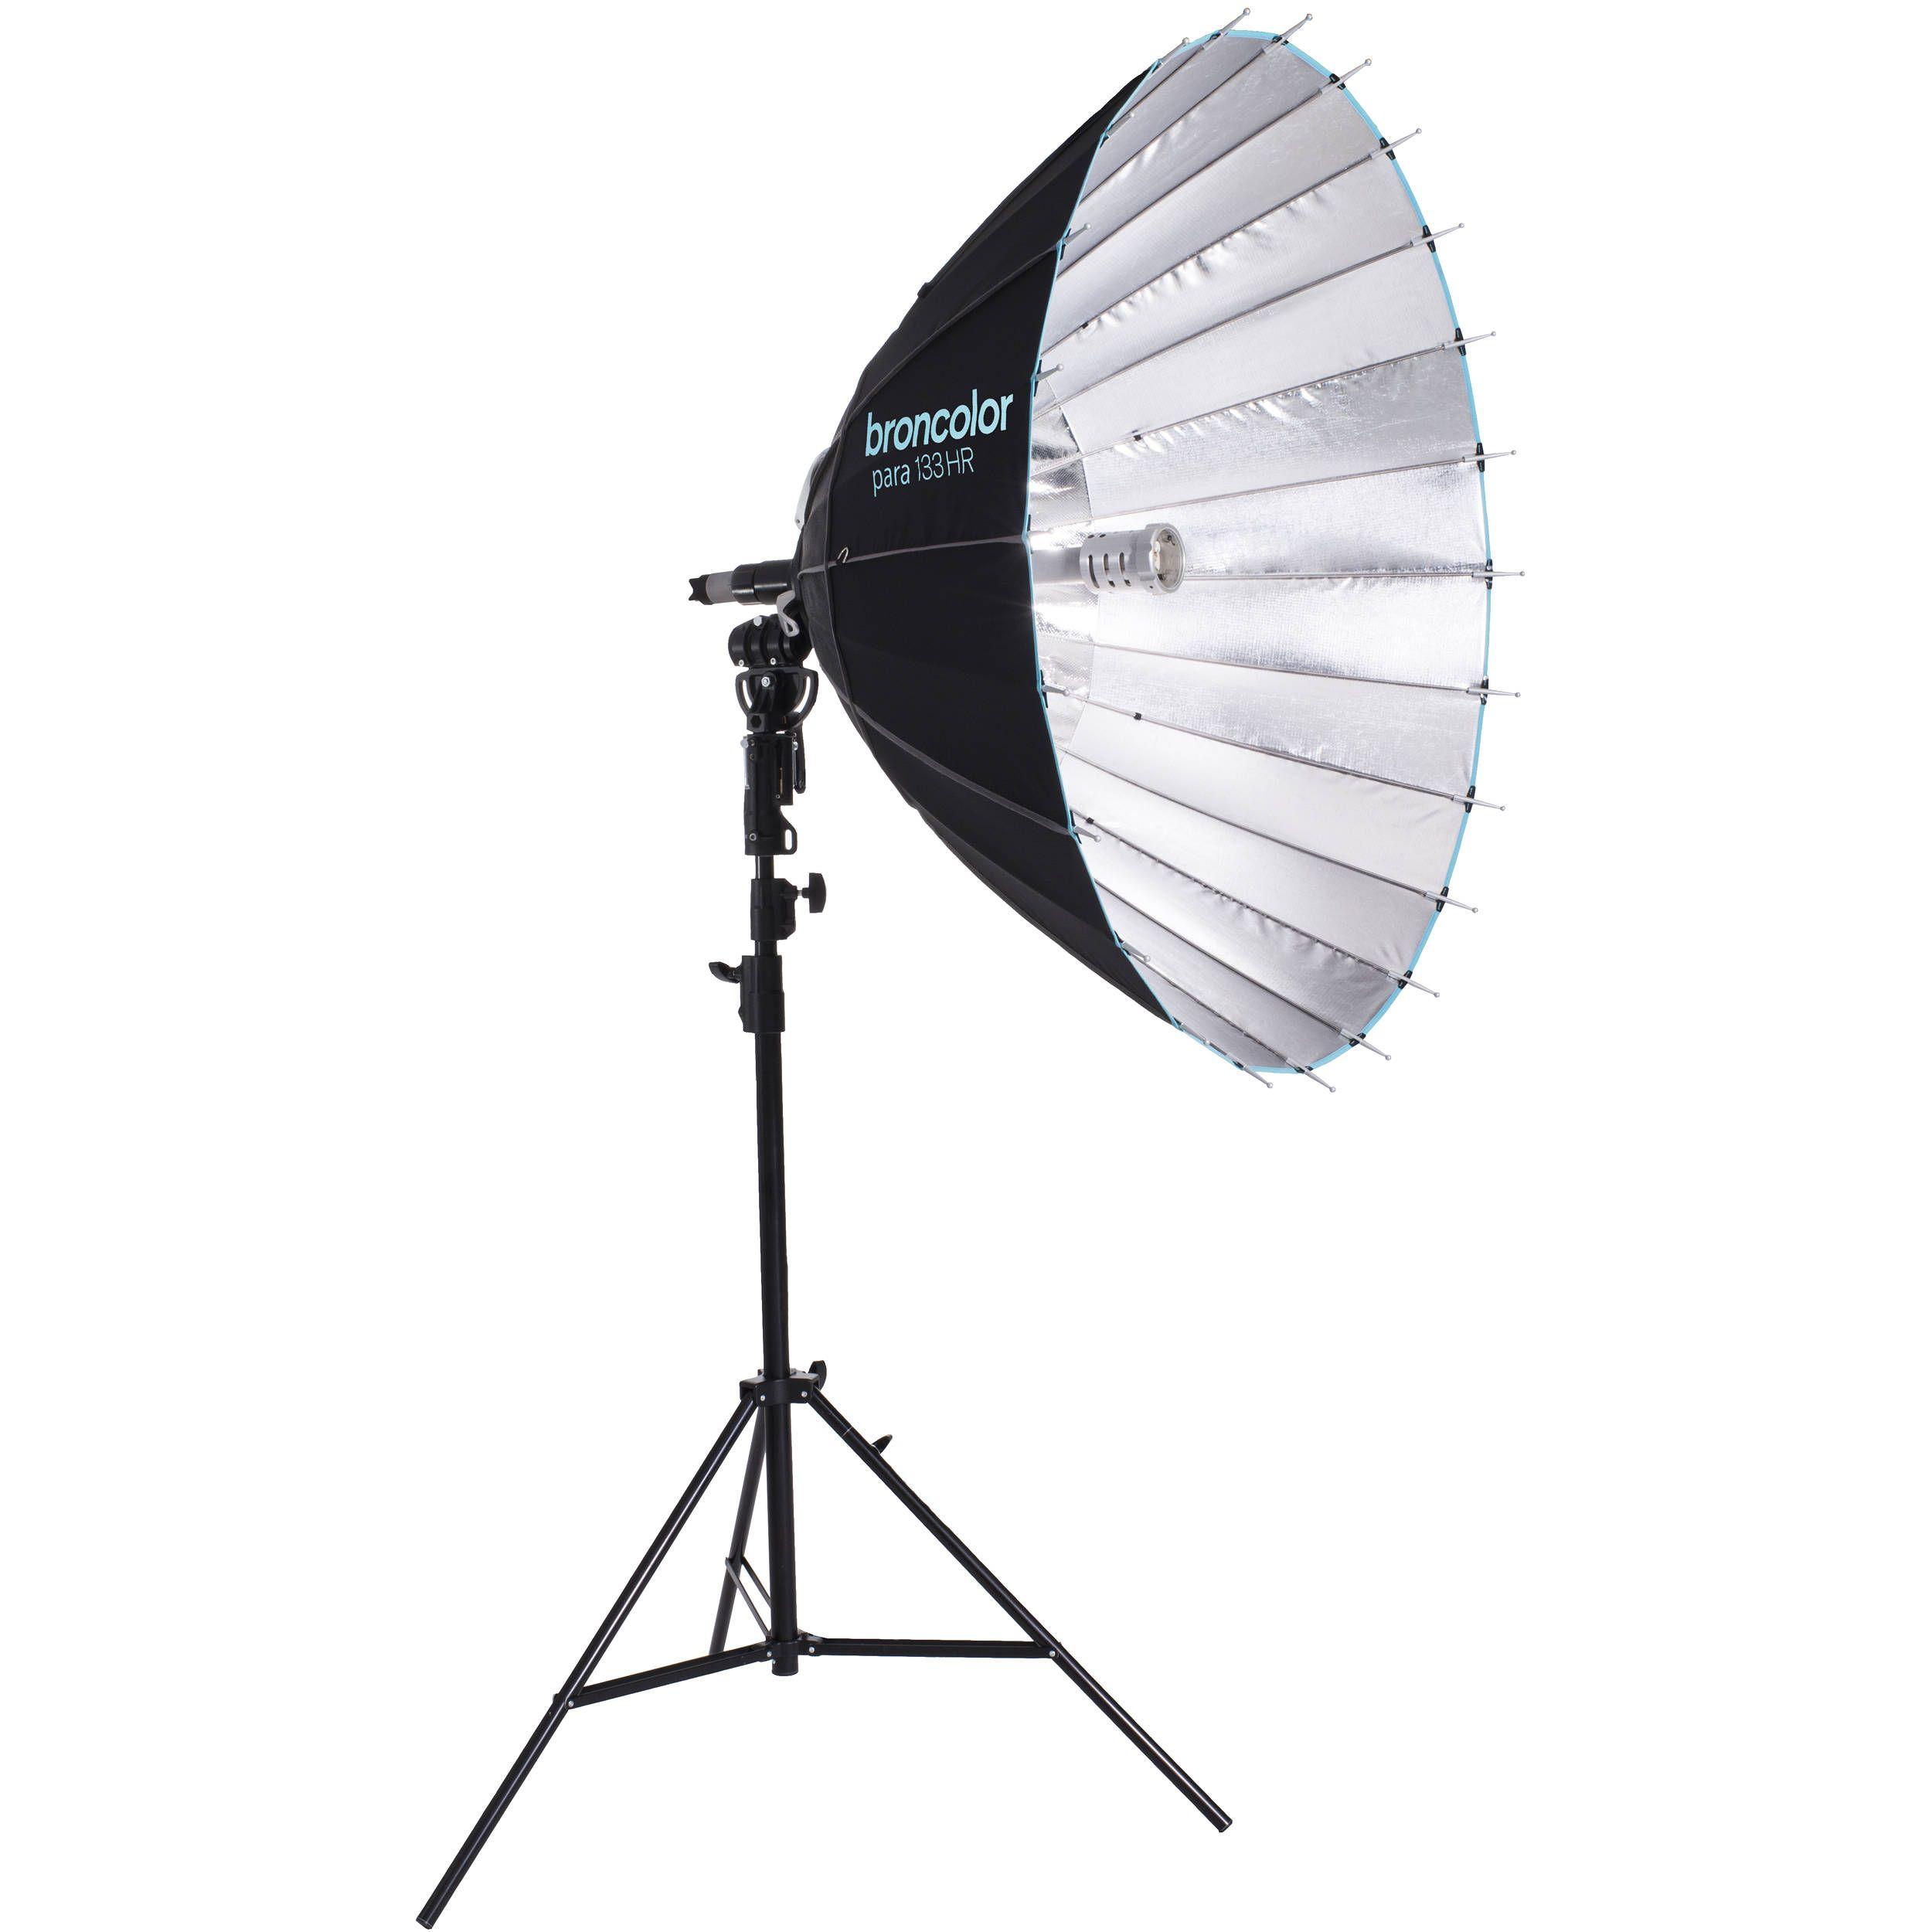 Broncolor Para 133 Ft Reflector Kit 52 Reflectors Lighting Gear Three Dimensional